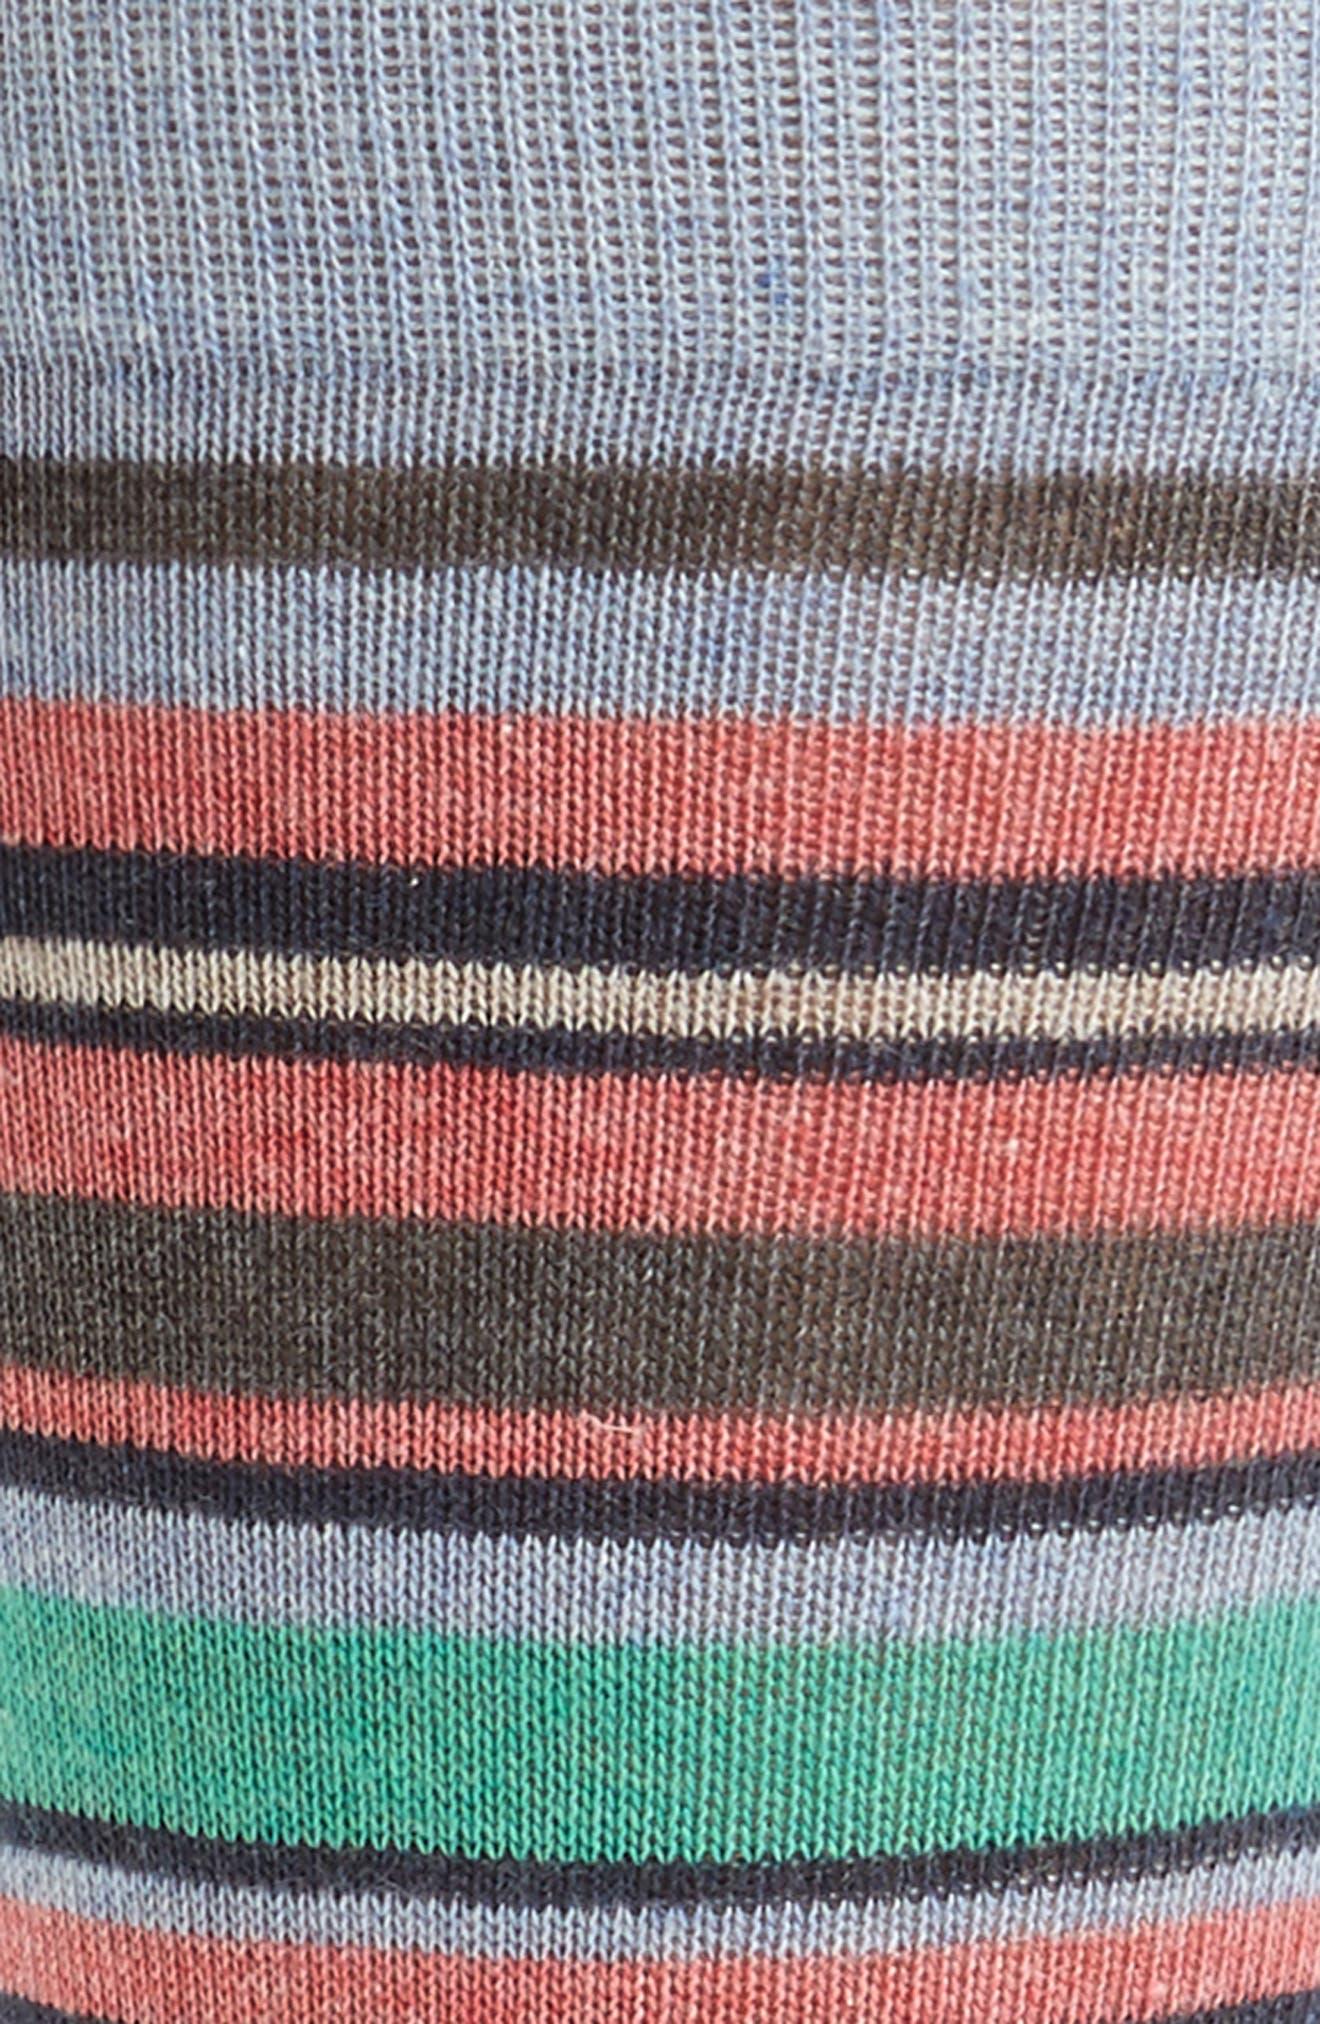 Stripe Cotton Blend Socks,                             Alternate thumbnail 2, color,                             Light Blue